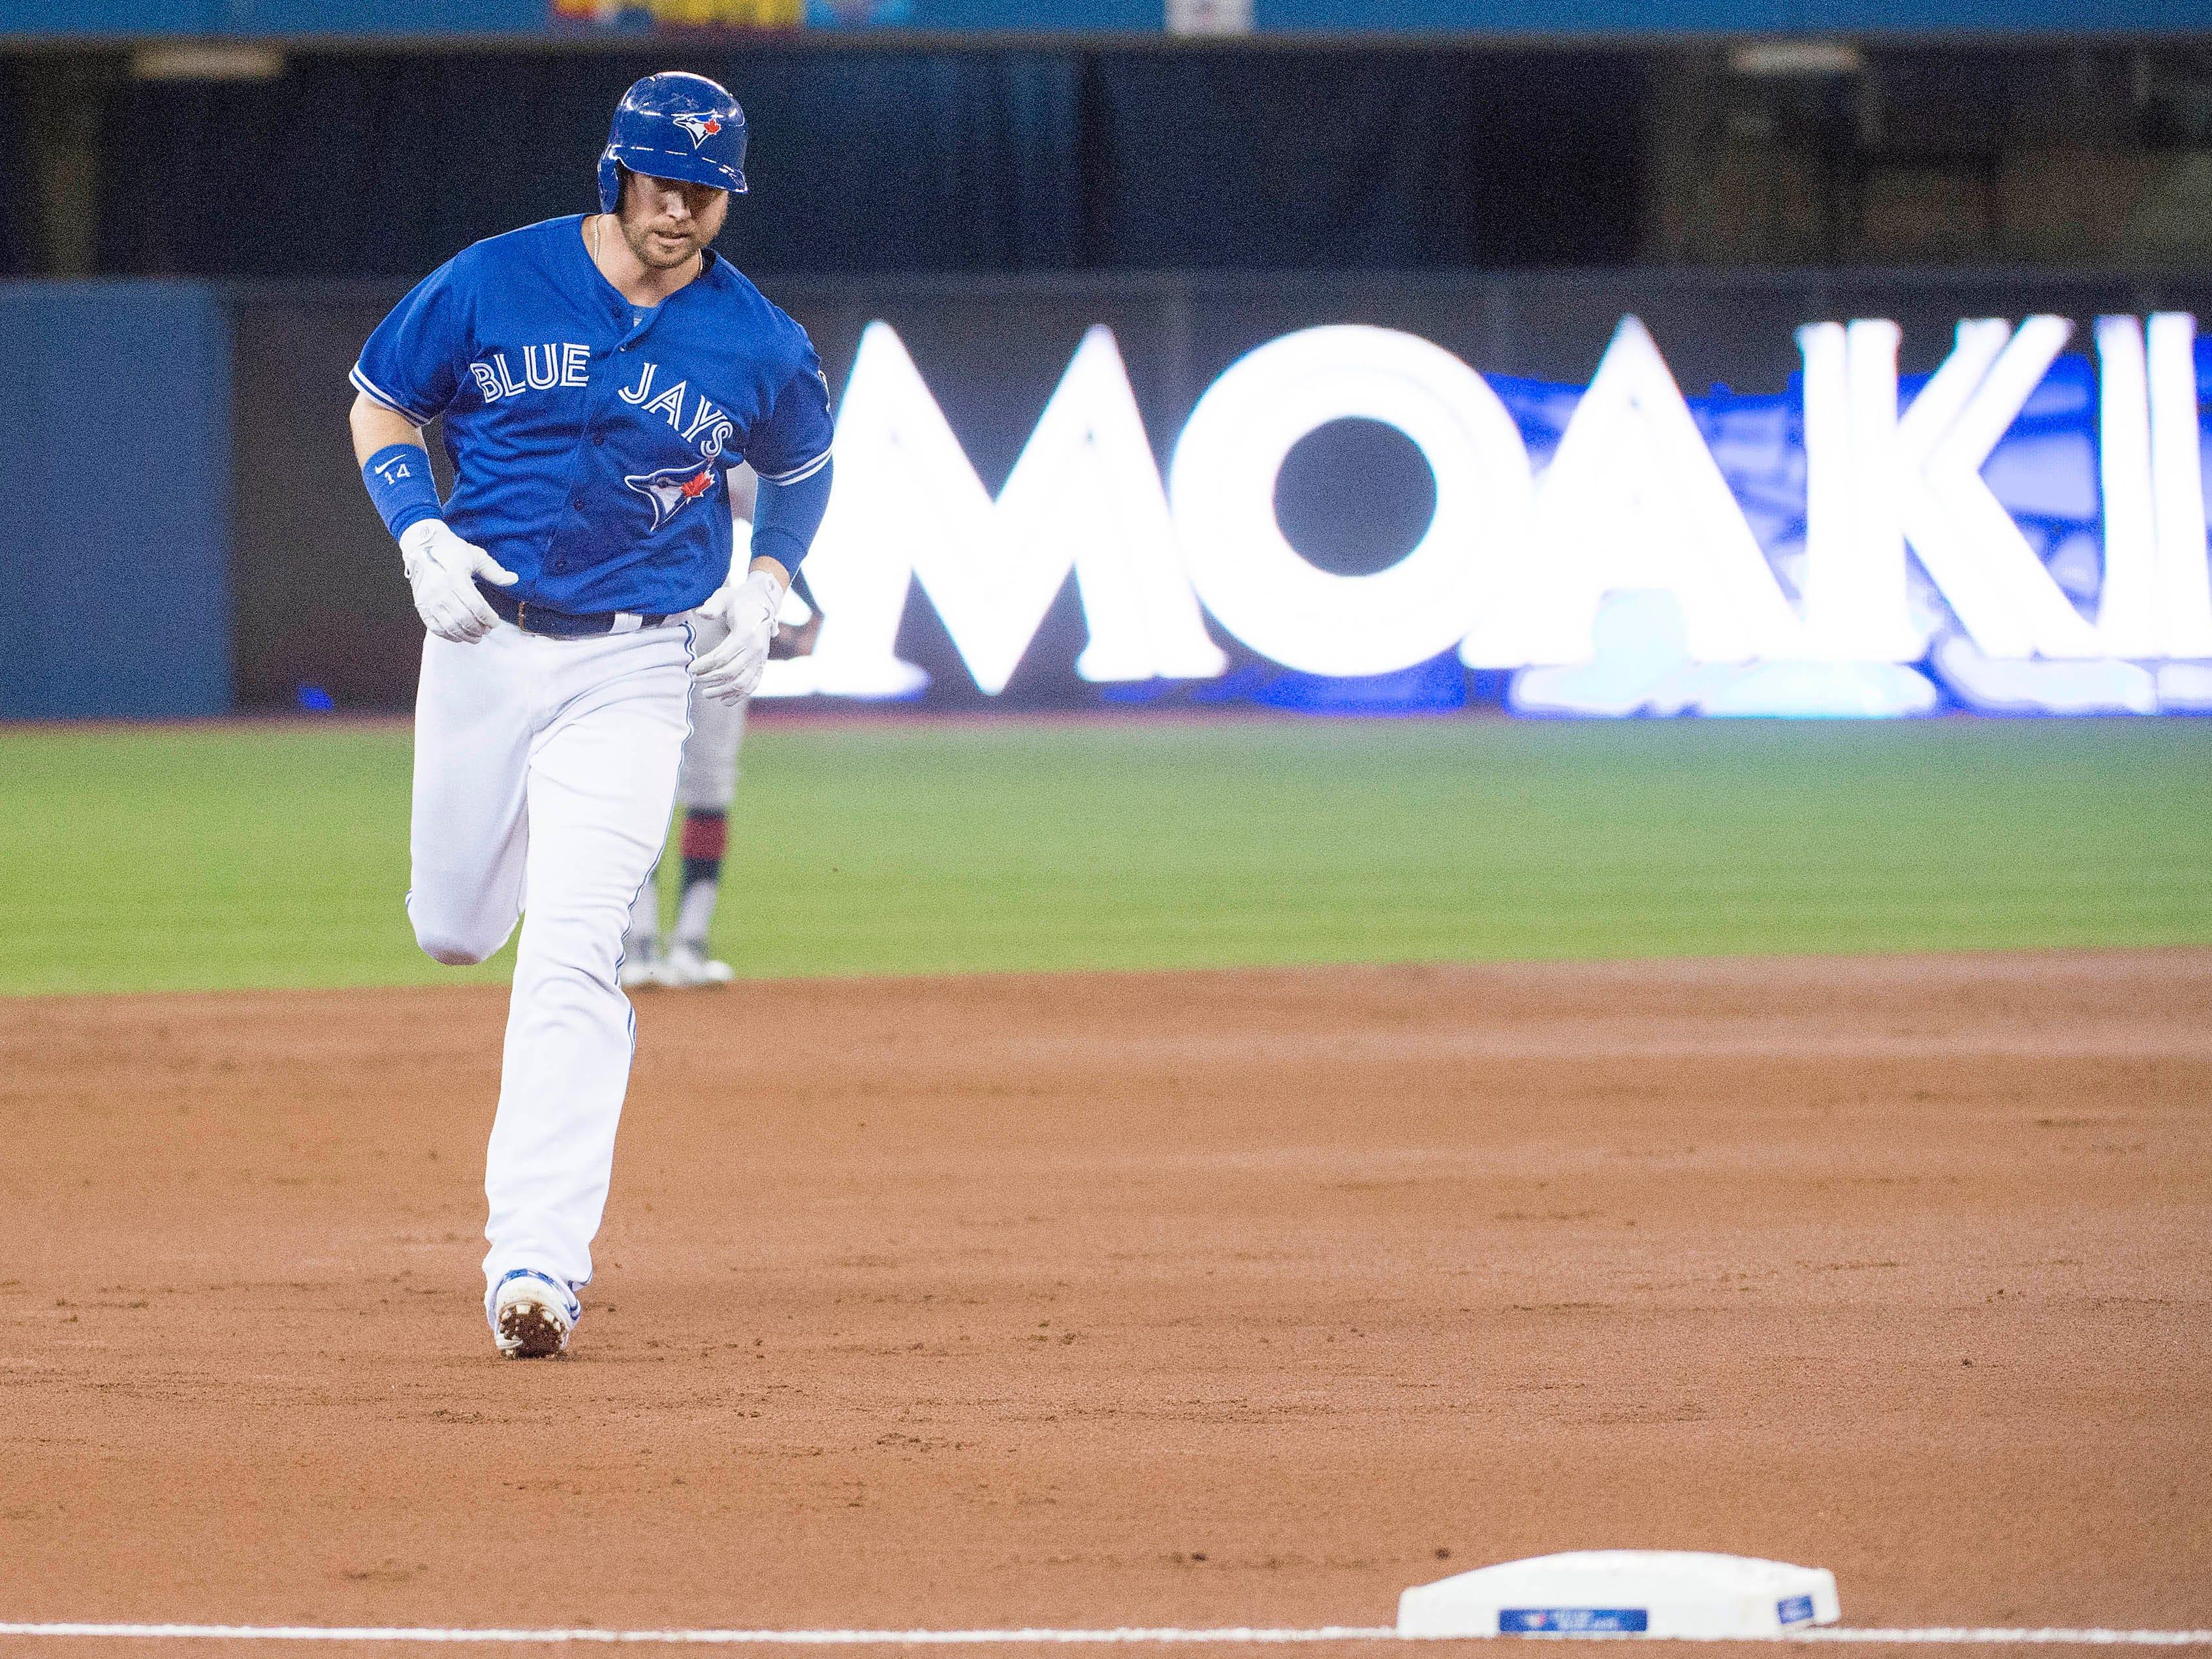 1B Justin Smoak, Blue Jays